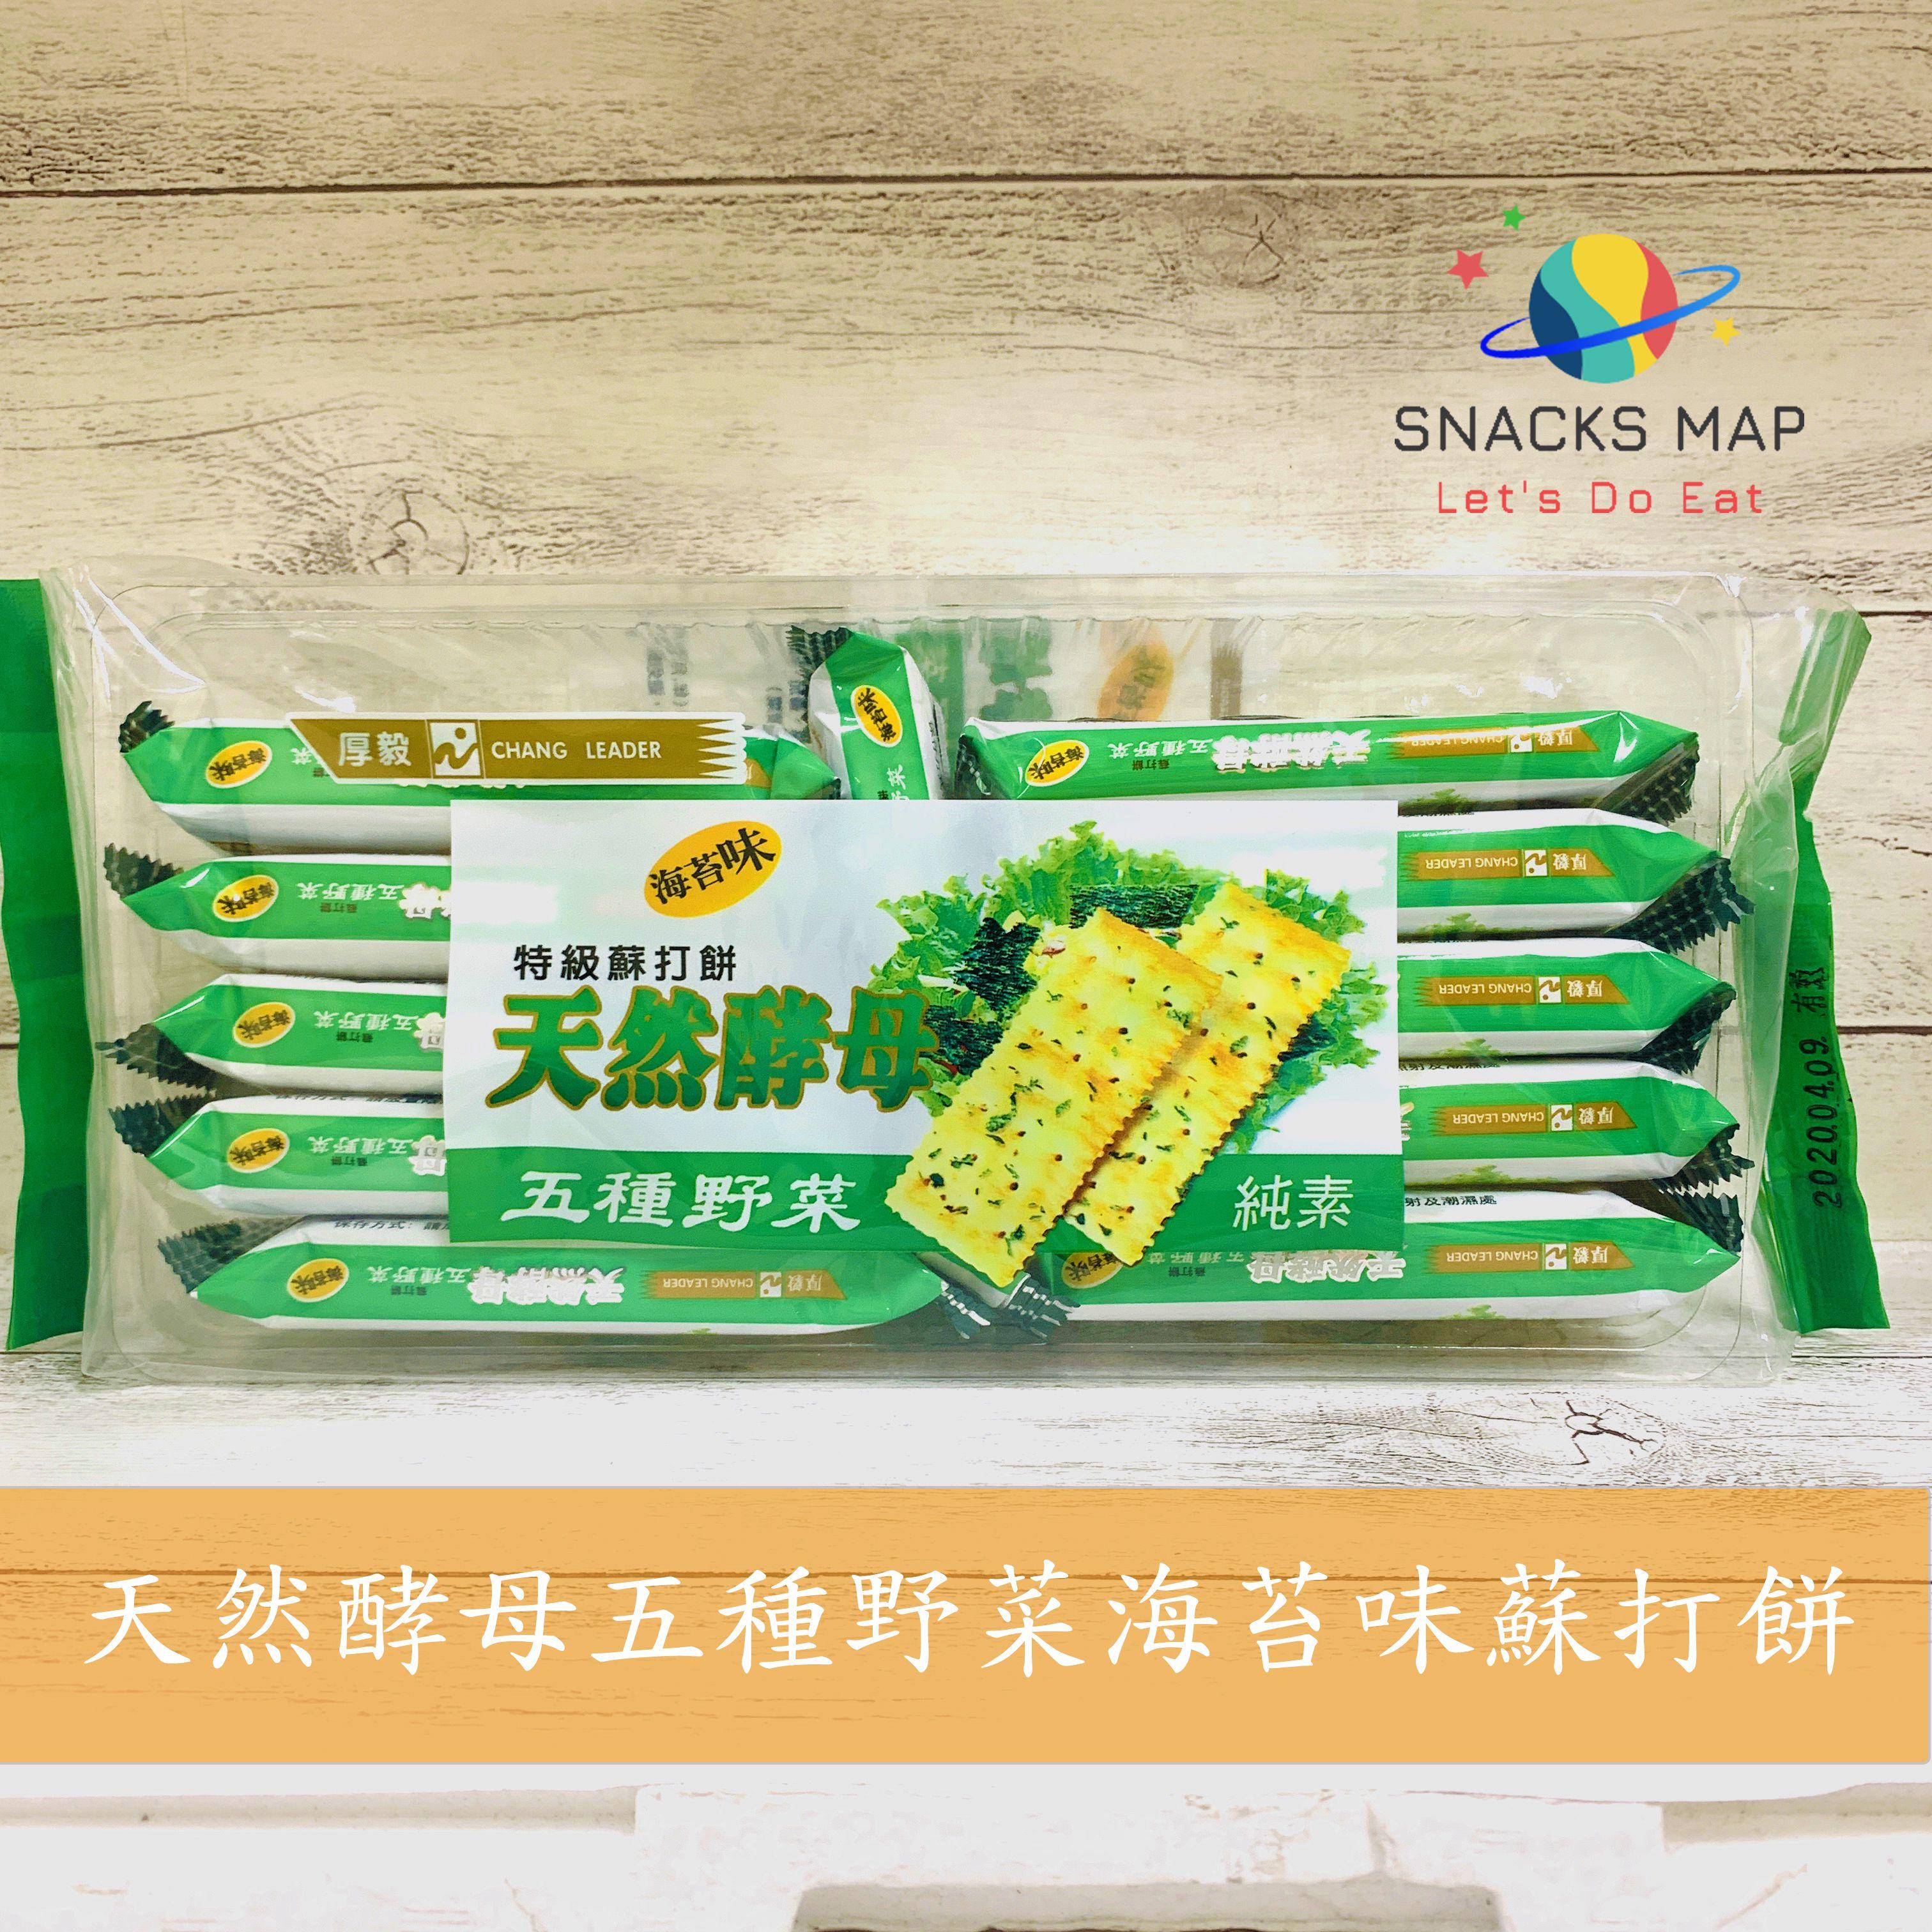 〔Snacks Map零食地圖〕野菜餅乾  蘇打餅   野菜蘇打餅   五種野菜蘇打餅系列(野菜味、海苔味) 290g     零食